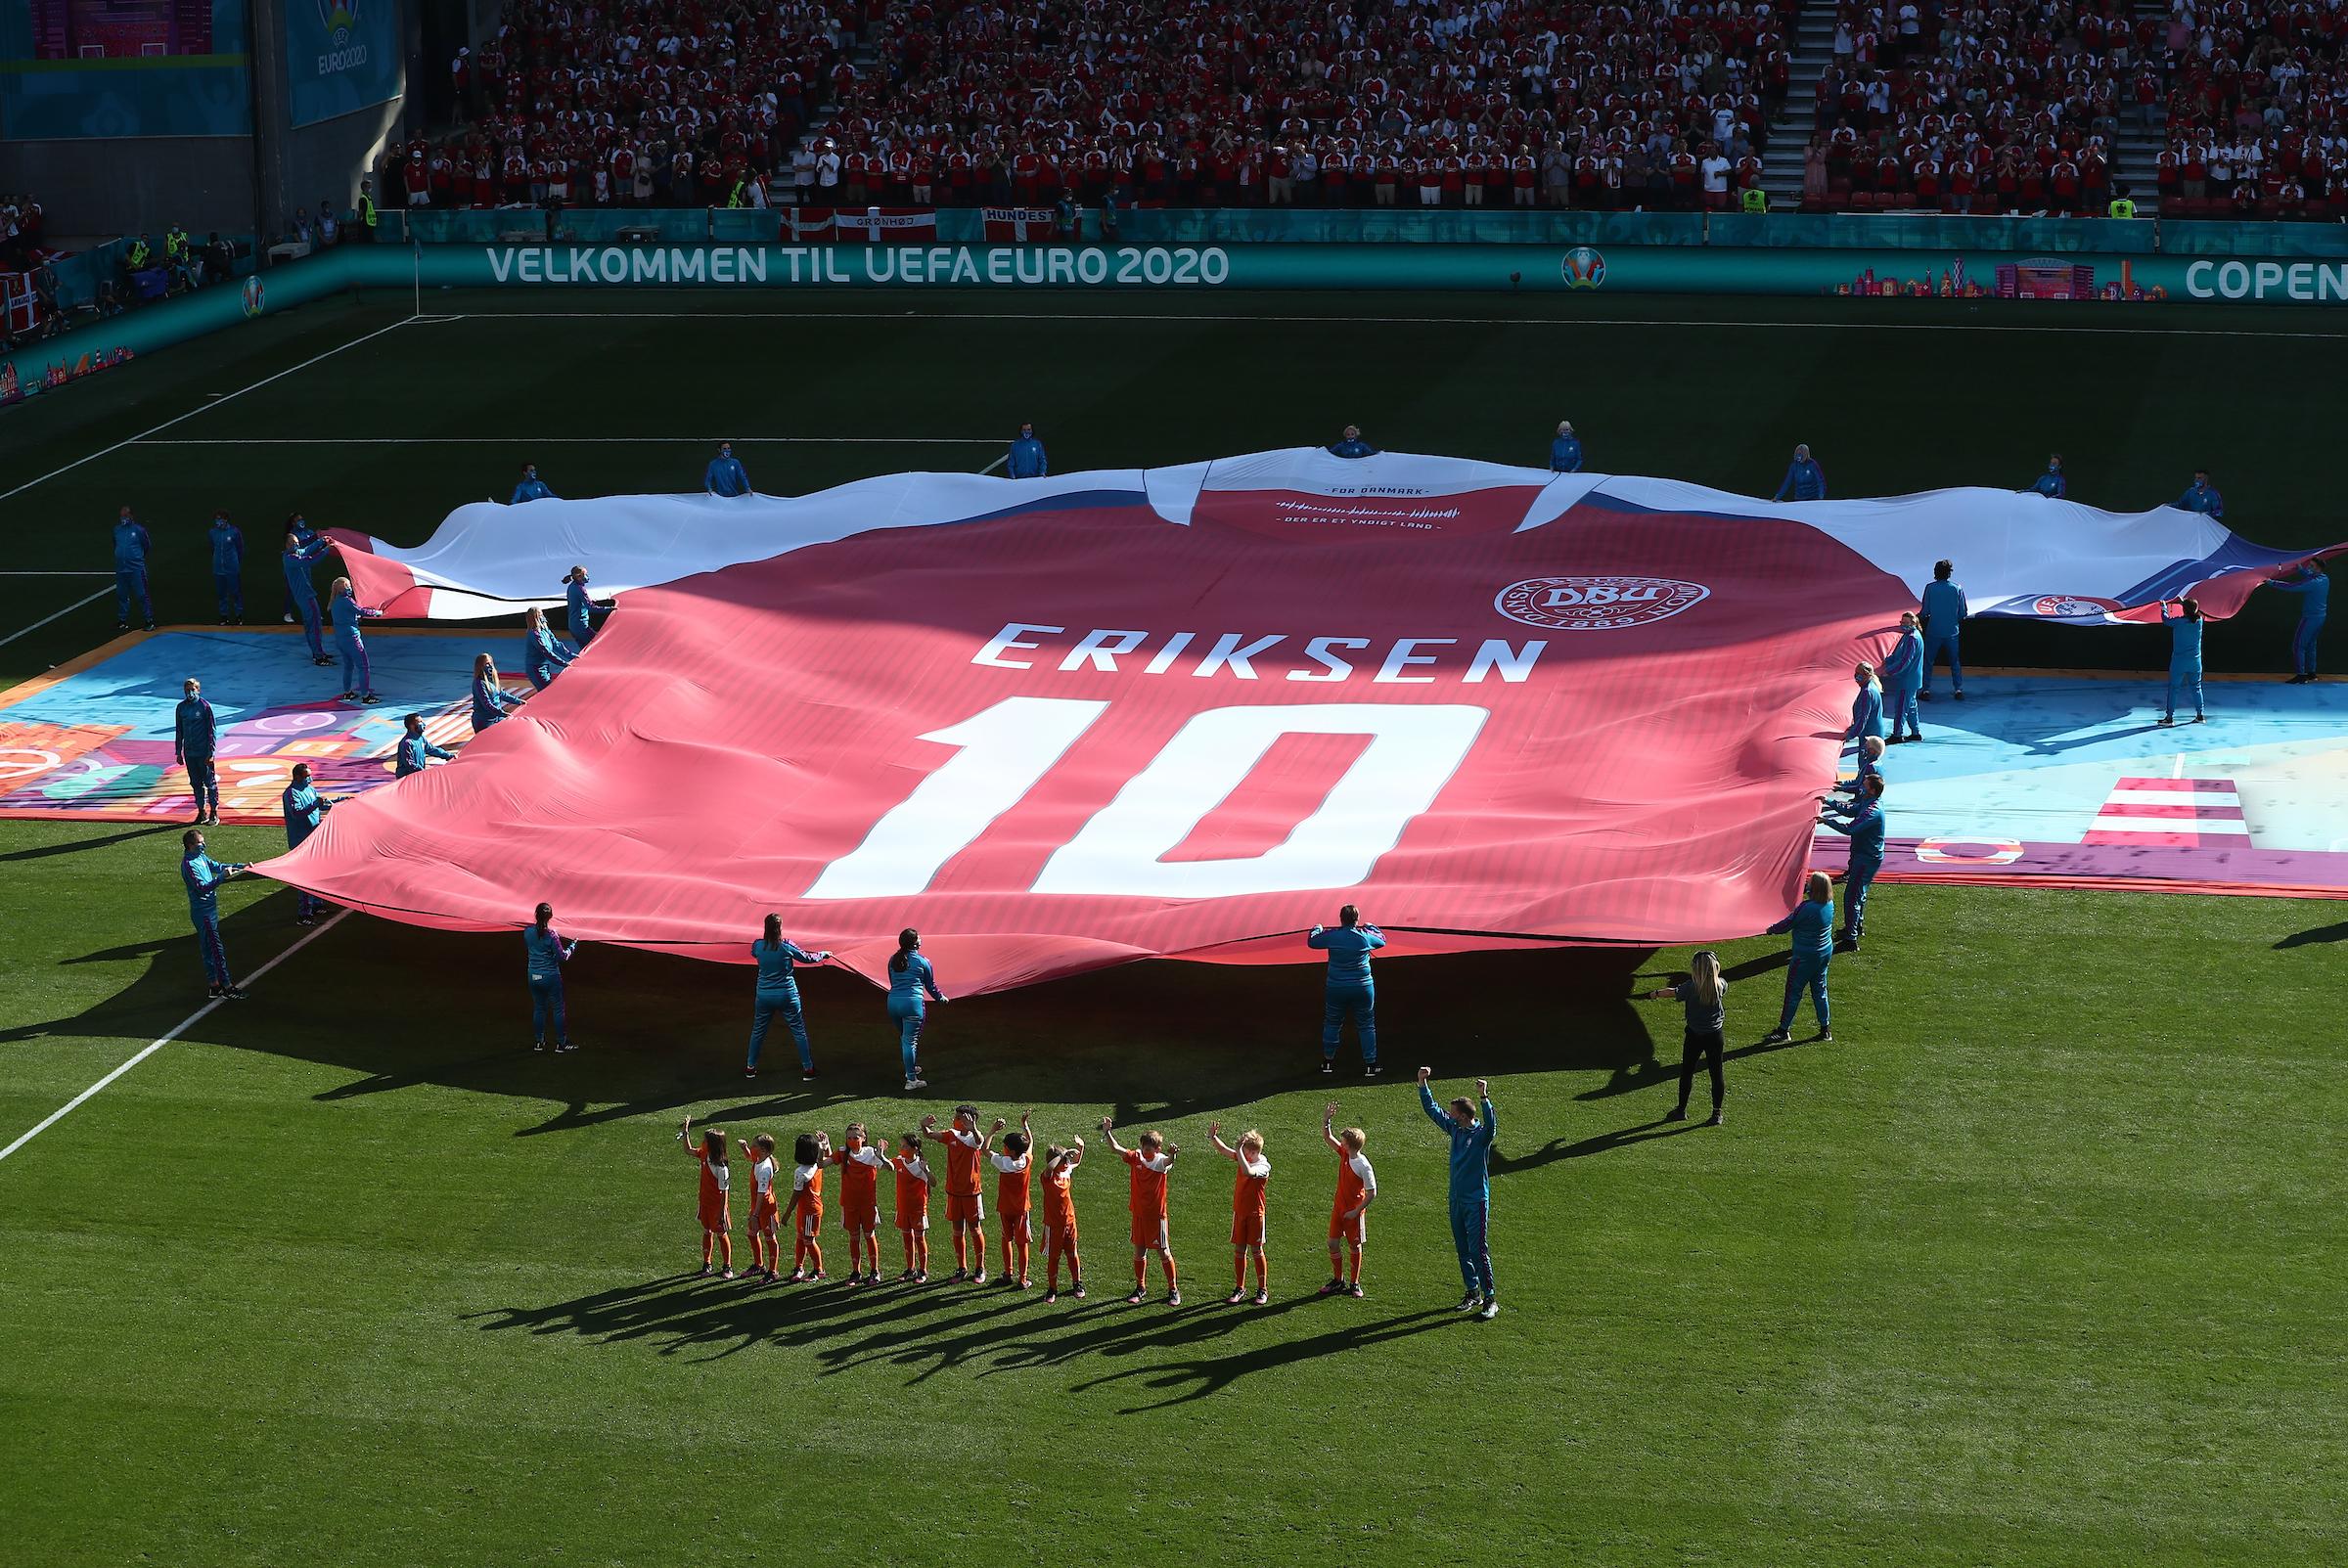 Ban tổ chức tri ân Eriksen trong trận Đan Mạch - Bỉ hôm 17/6.